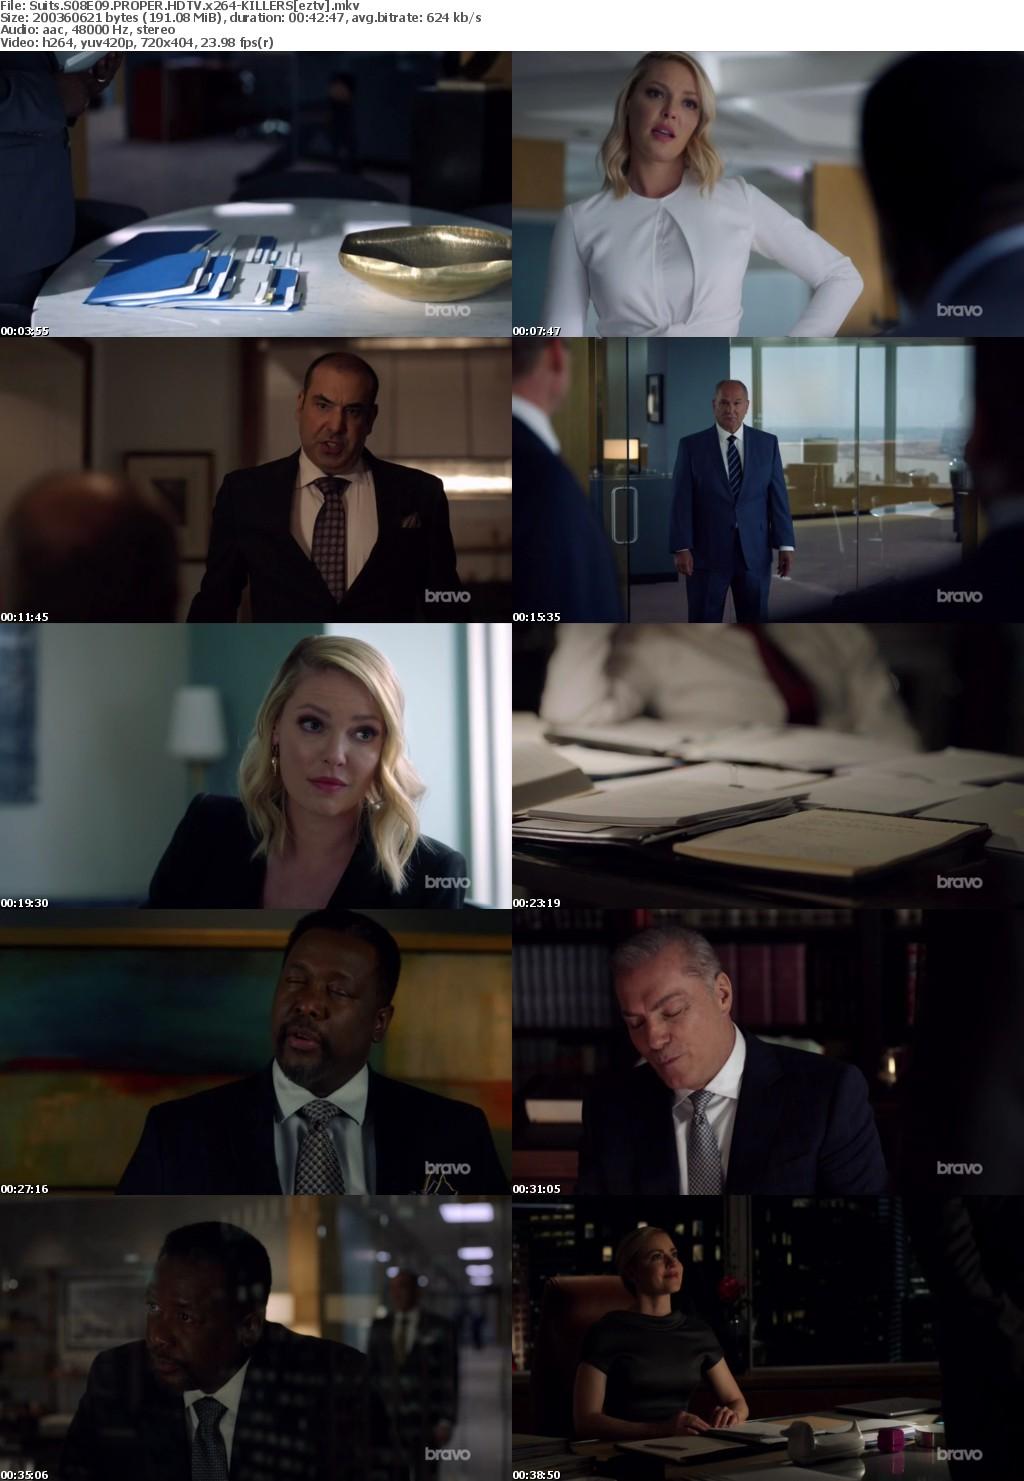 Suits S08E09 PROPER HDTV x264-KILLERS